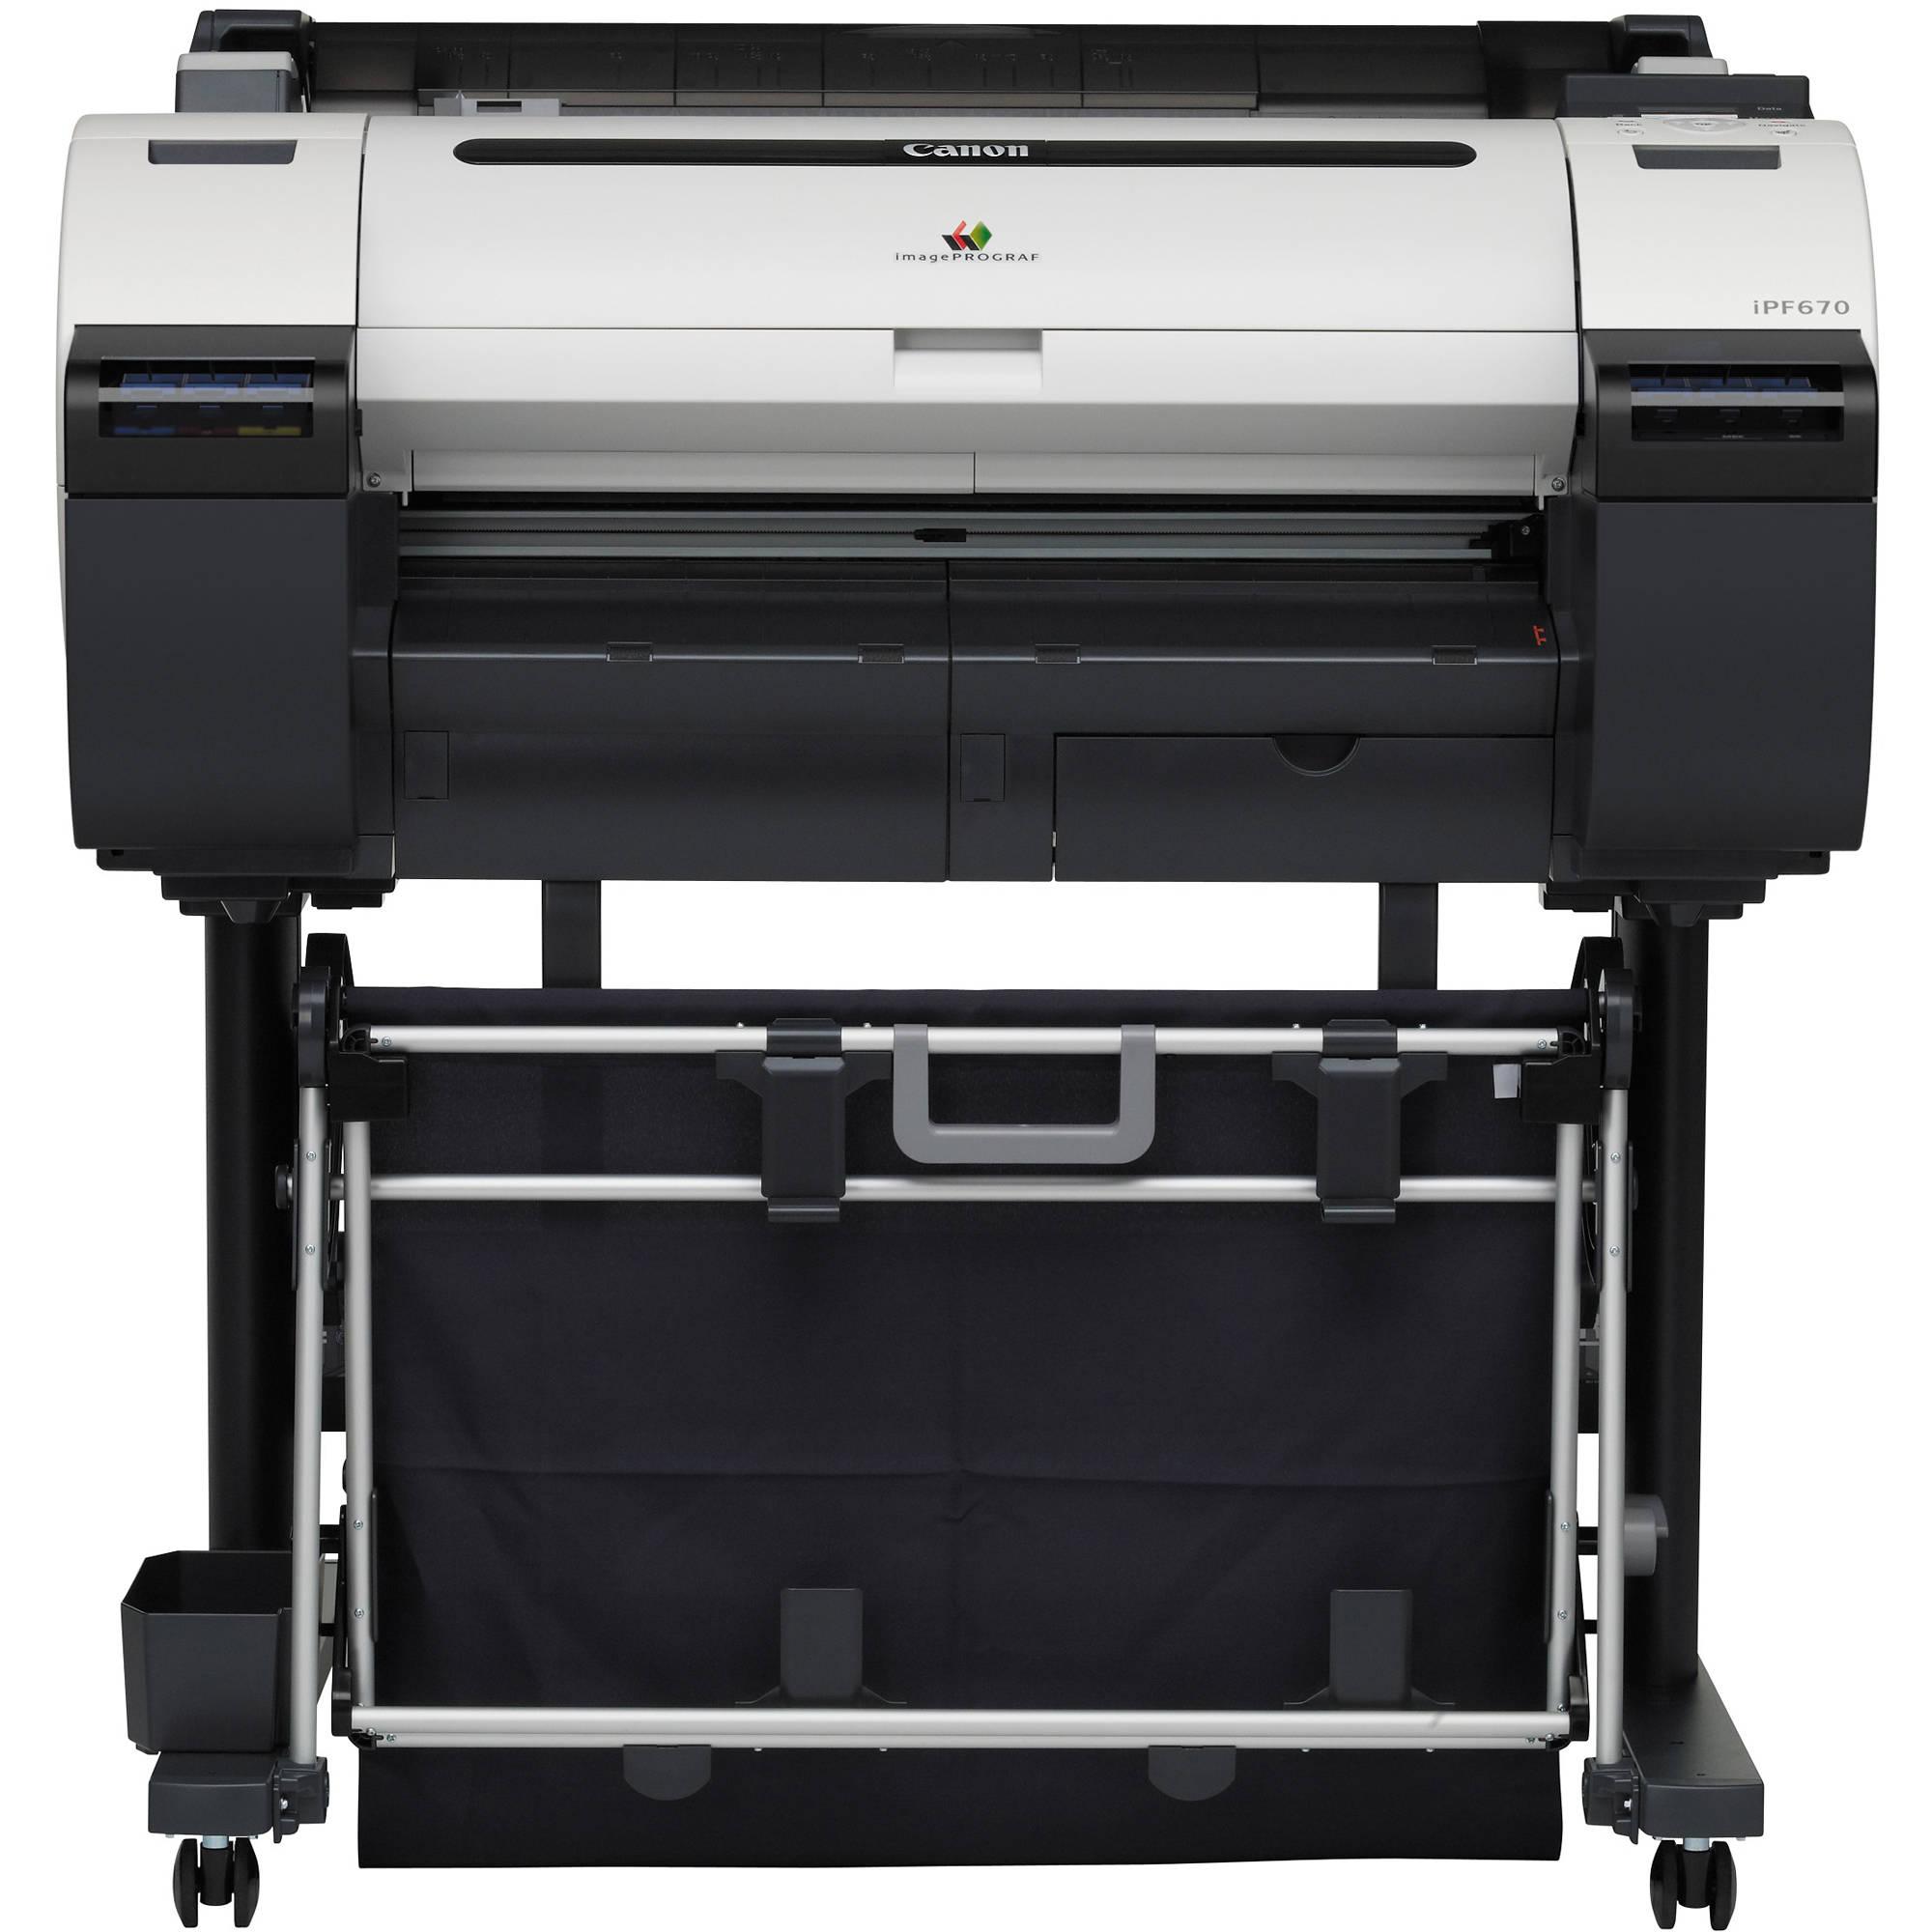 Плоттер Canon imagePROGRAF iPF670 (24, A1, 2400x1200dpi, LAN, USB 2.0) плоттер canon imageprograf ipf785